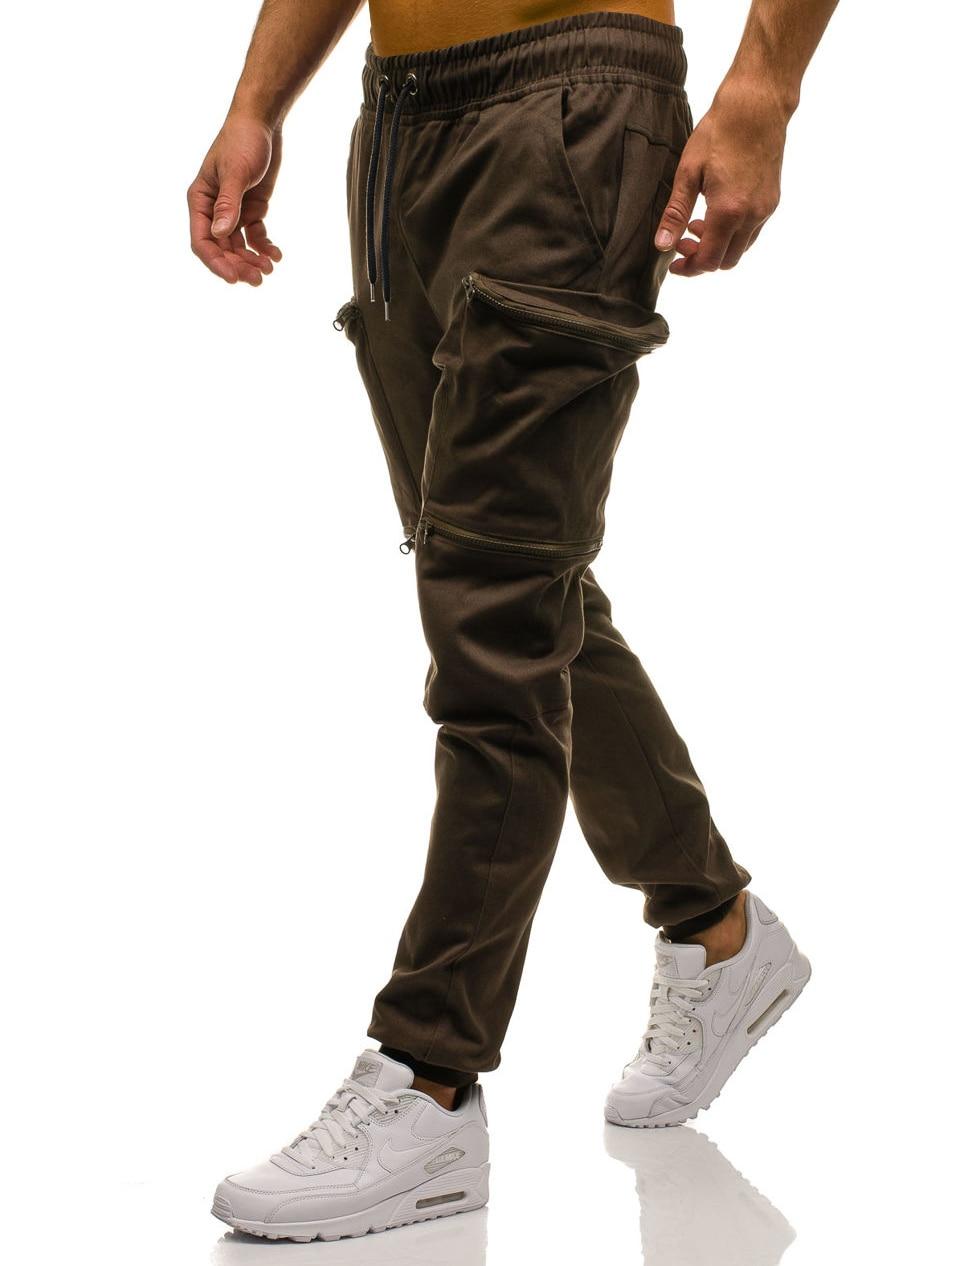 HTB1apzuL4YaK1RjSZFnq6y80pXa8 Mens Joggers 2019 New Red Camouflage Multi-Pockets Cargo Pants Men Cotton Harem Pants Hip Hop Trousers Streetwear XXXL